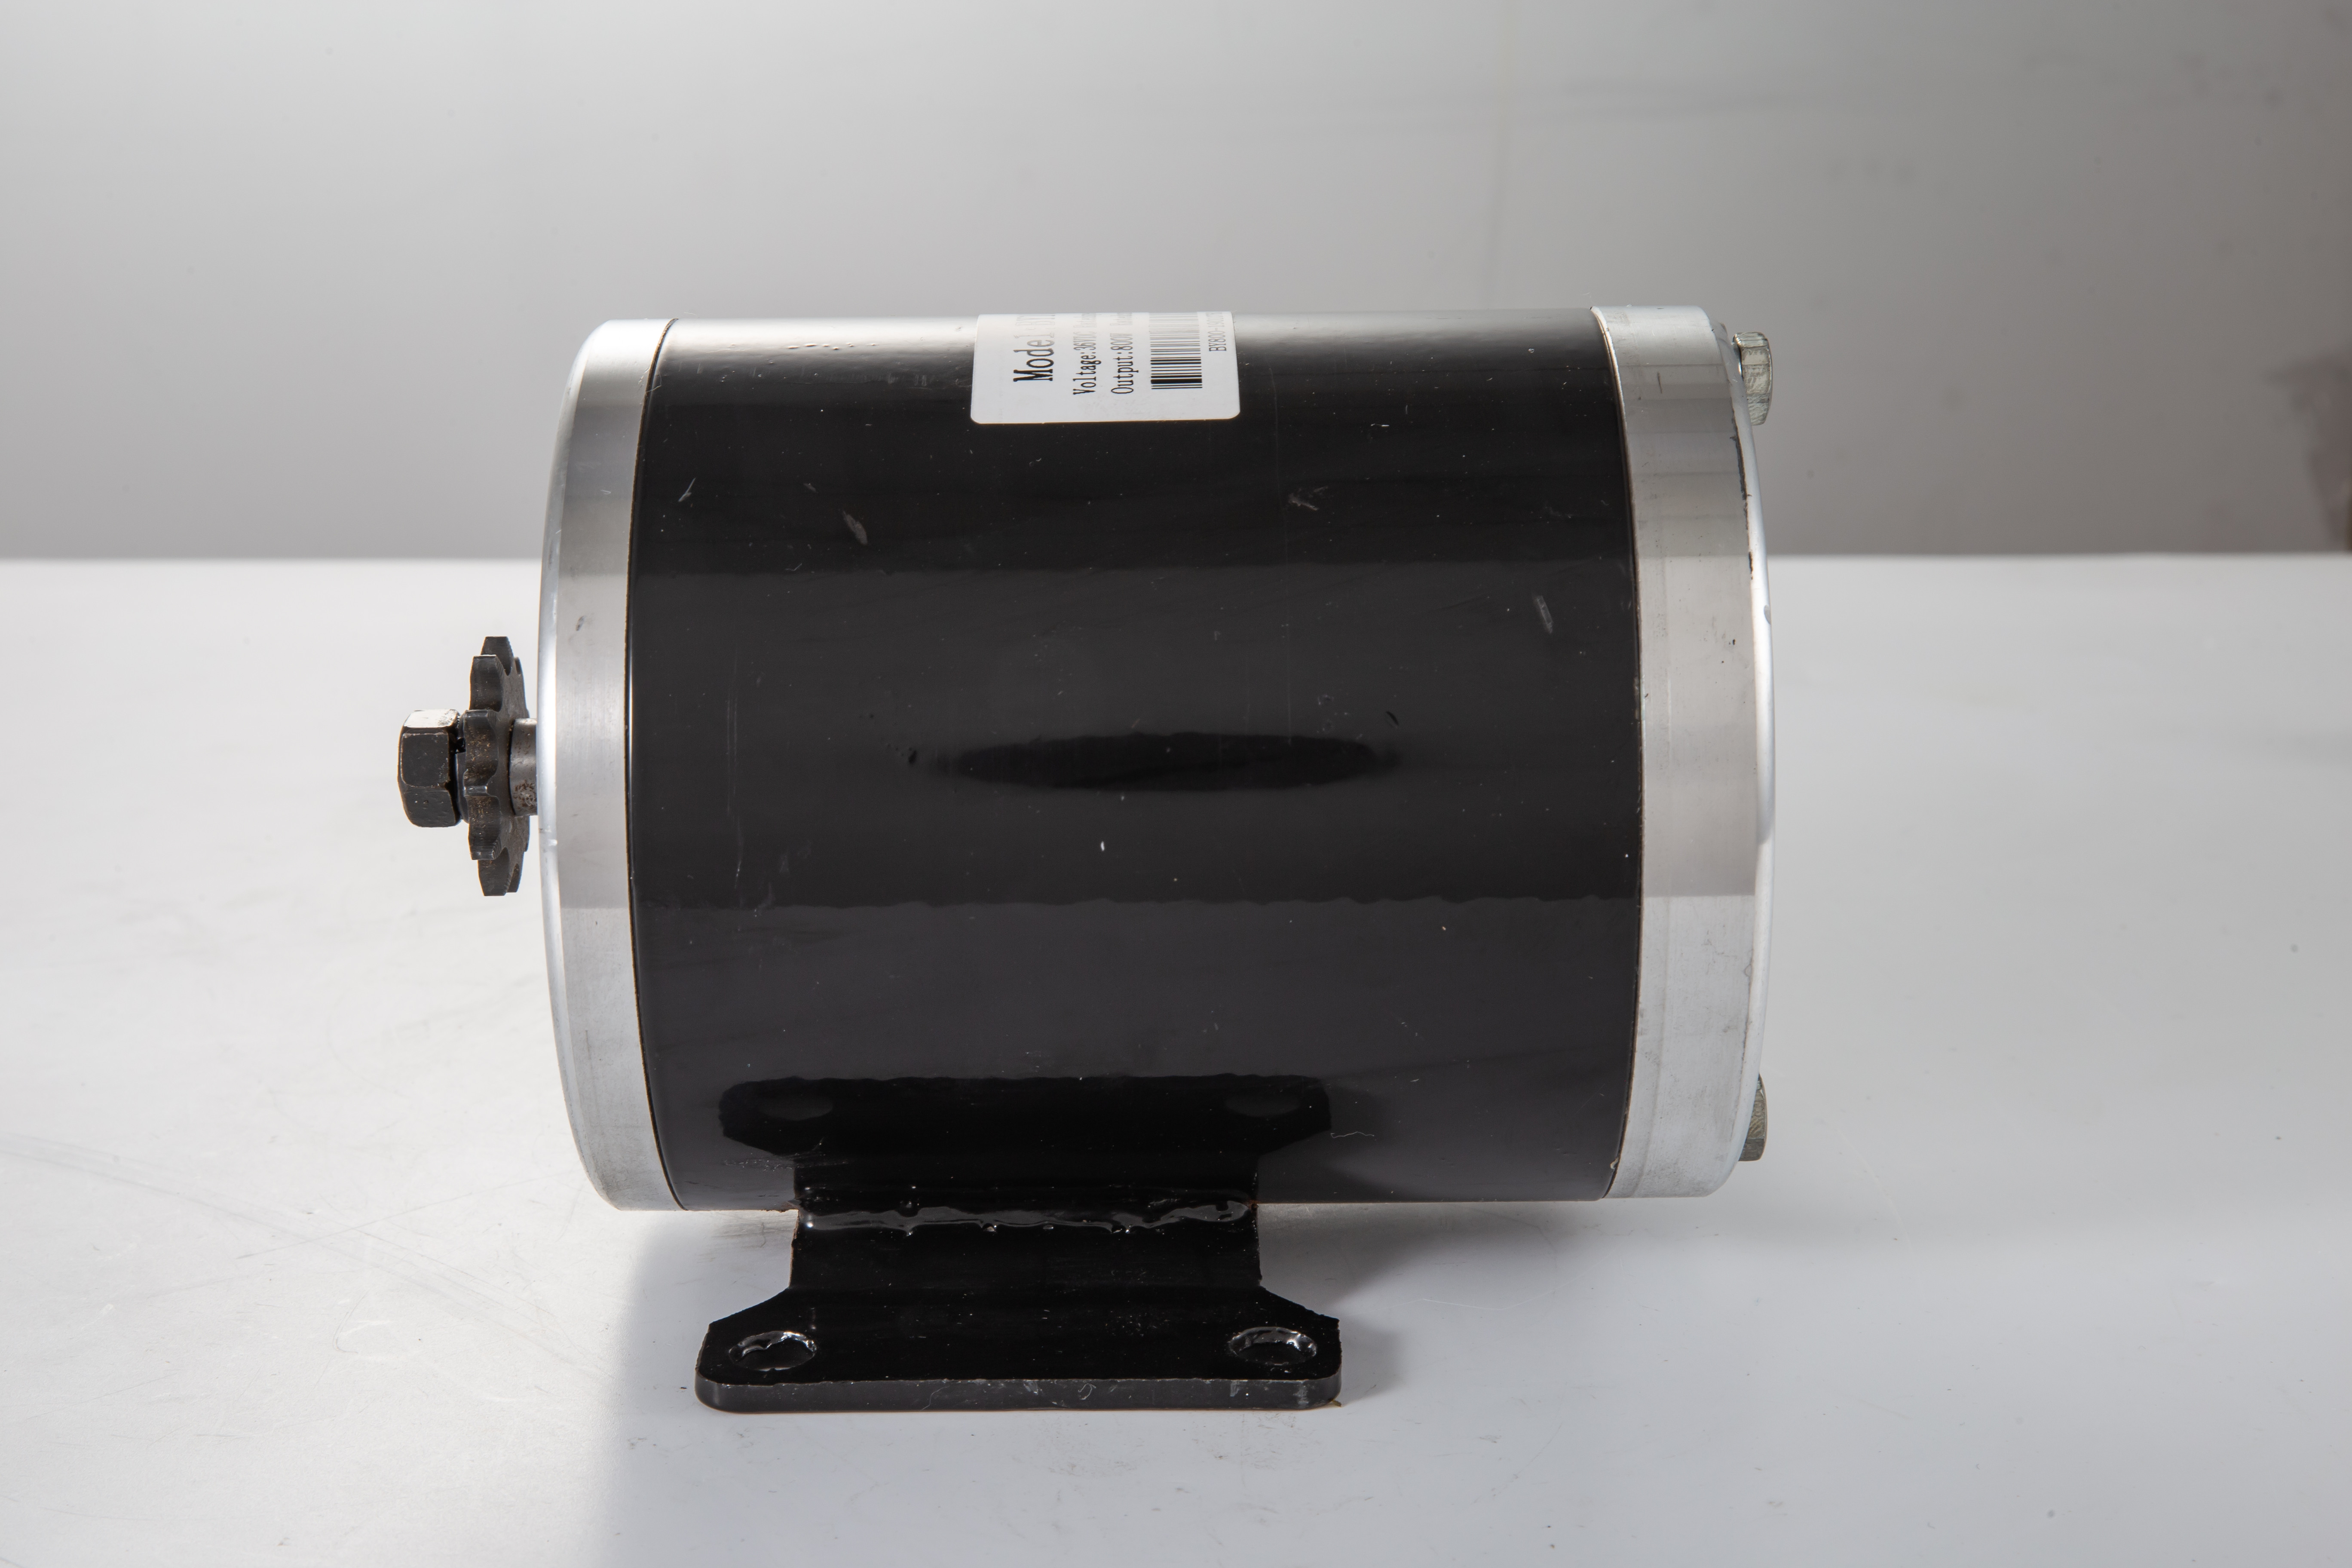 36v-Electric-Motor-controller-throttle-kit-f-Scooter-E-Scooter-ATV-Permanent thumbnail 163